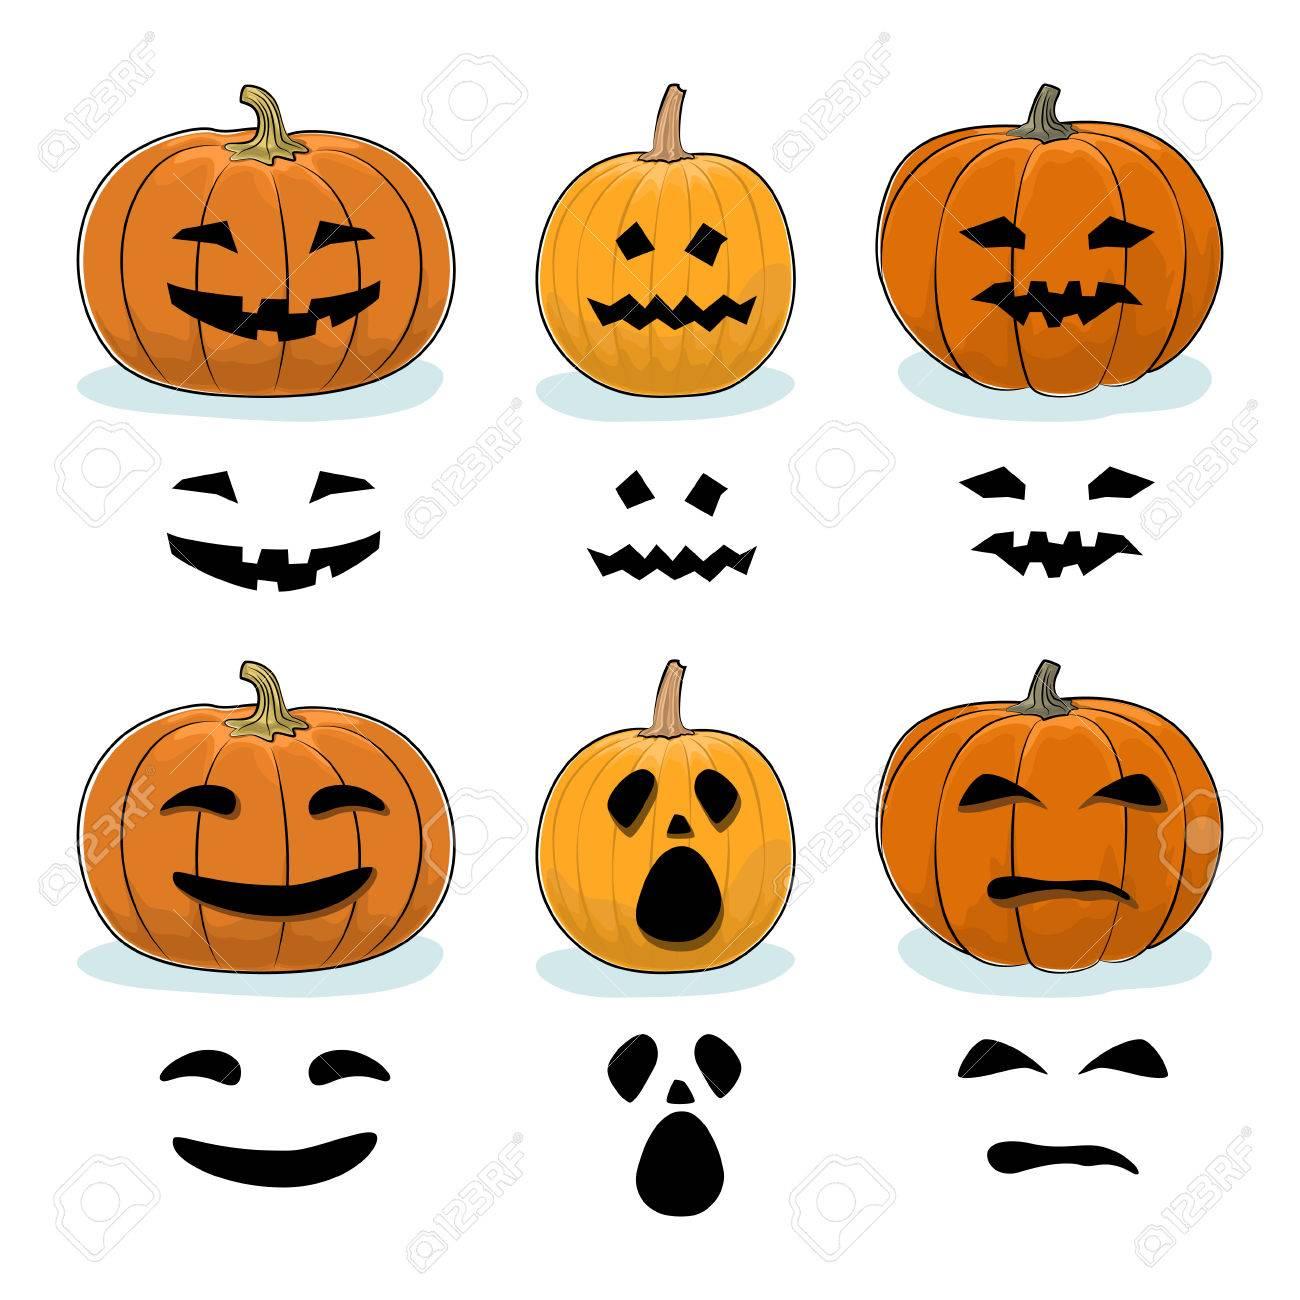 Set Of Carved Scary Halloween Pumpkins, A Jack-o-Lantern, Pumpkin ...